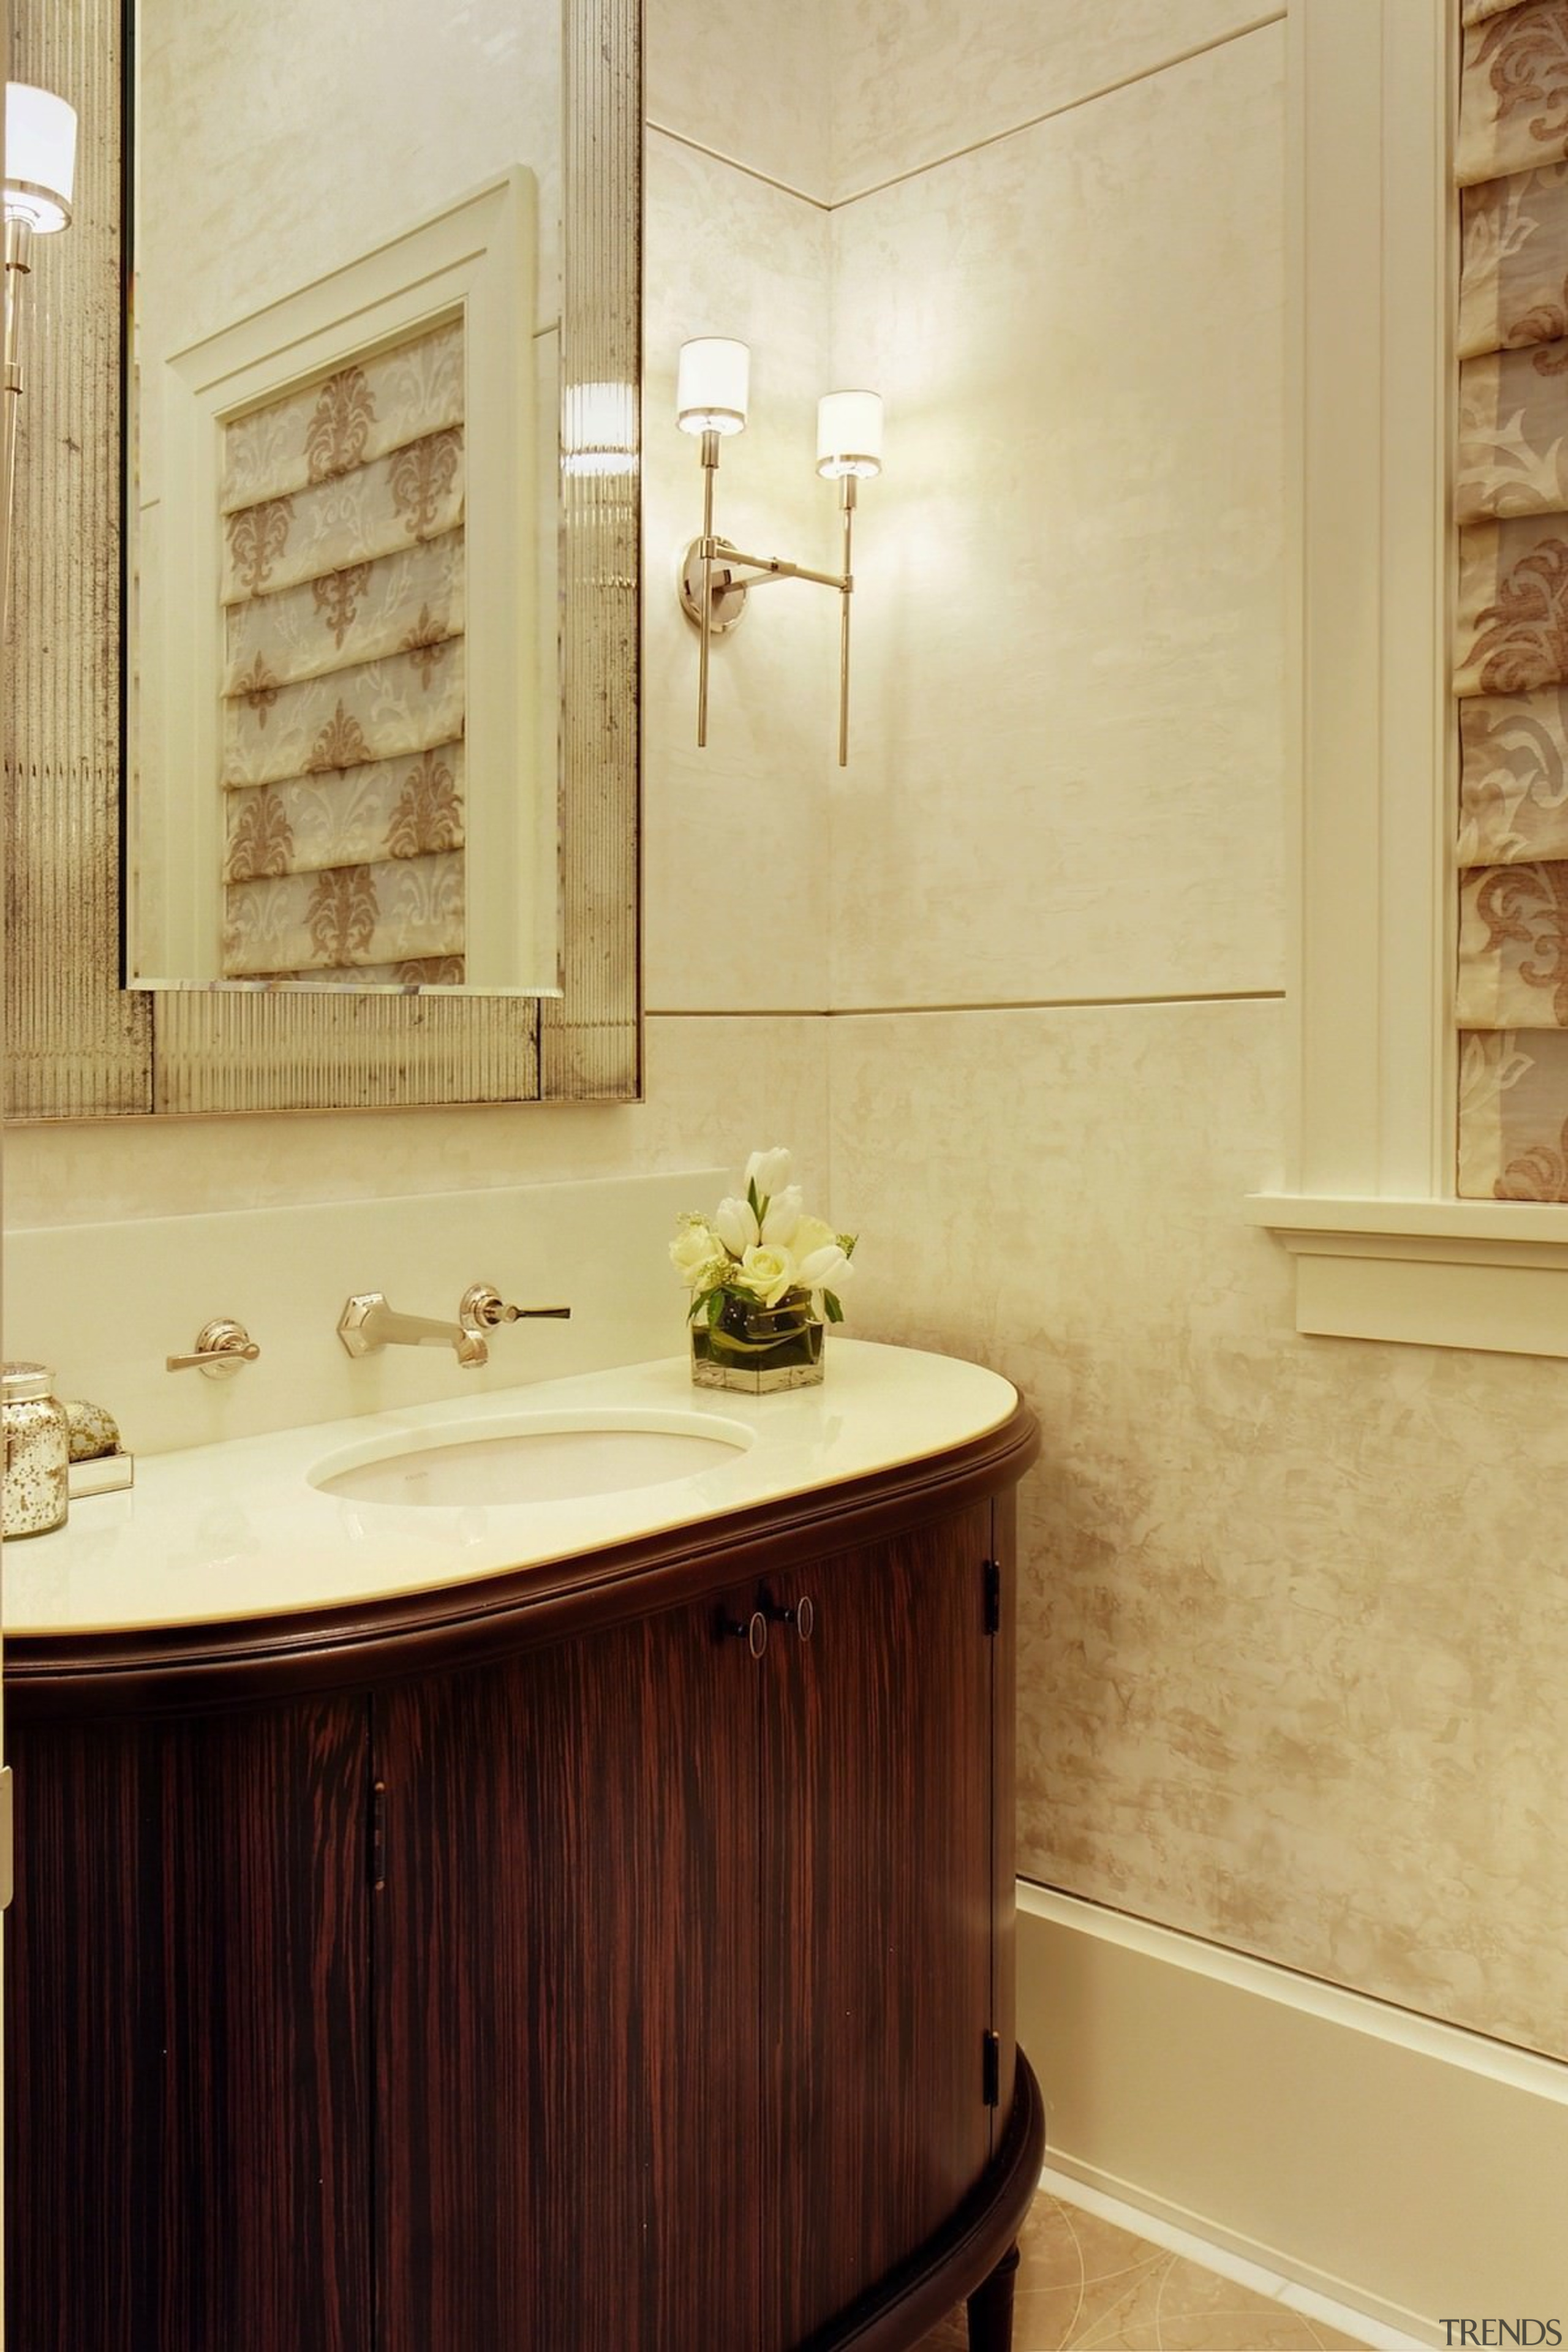 This powder room is like stepping back in bathroom, bathroom accessory, bathroom cabinet, cabinetry, floor, flooring, home, interior design, room, sink, tile, wall, orange